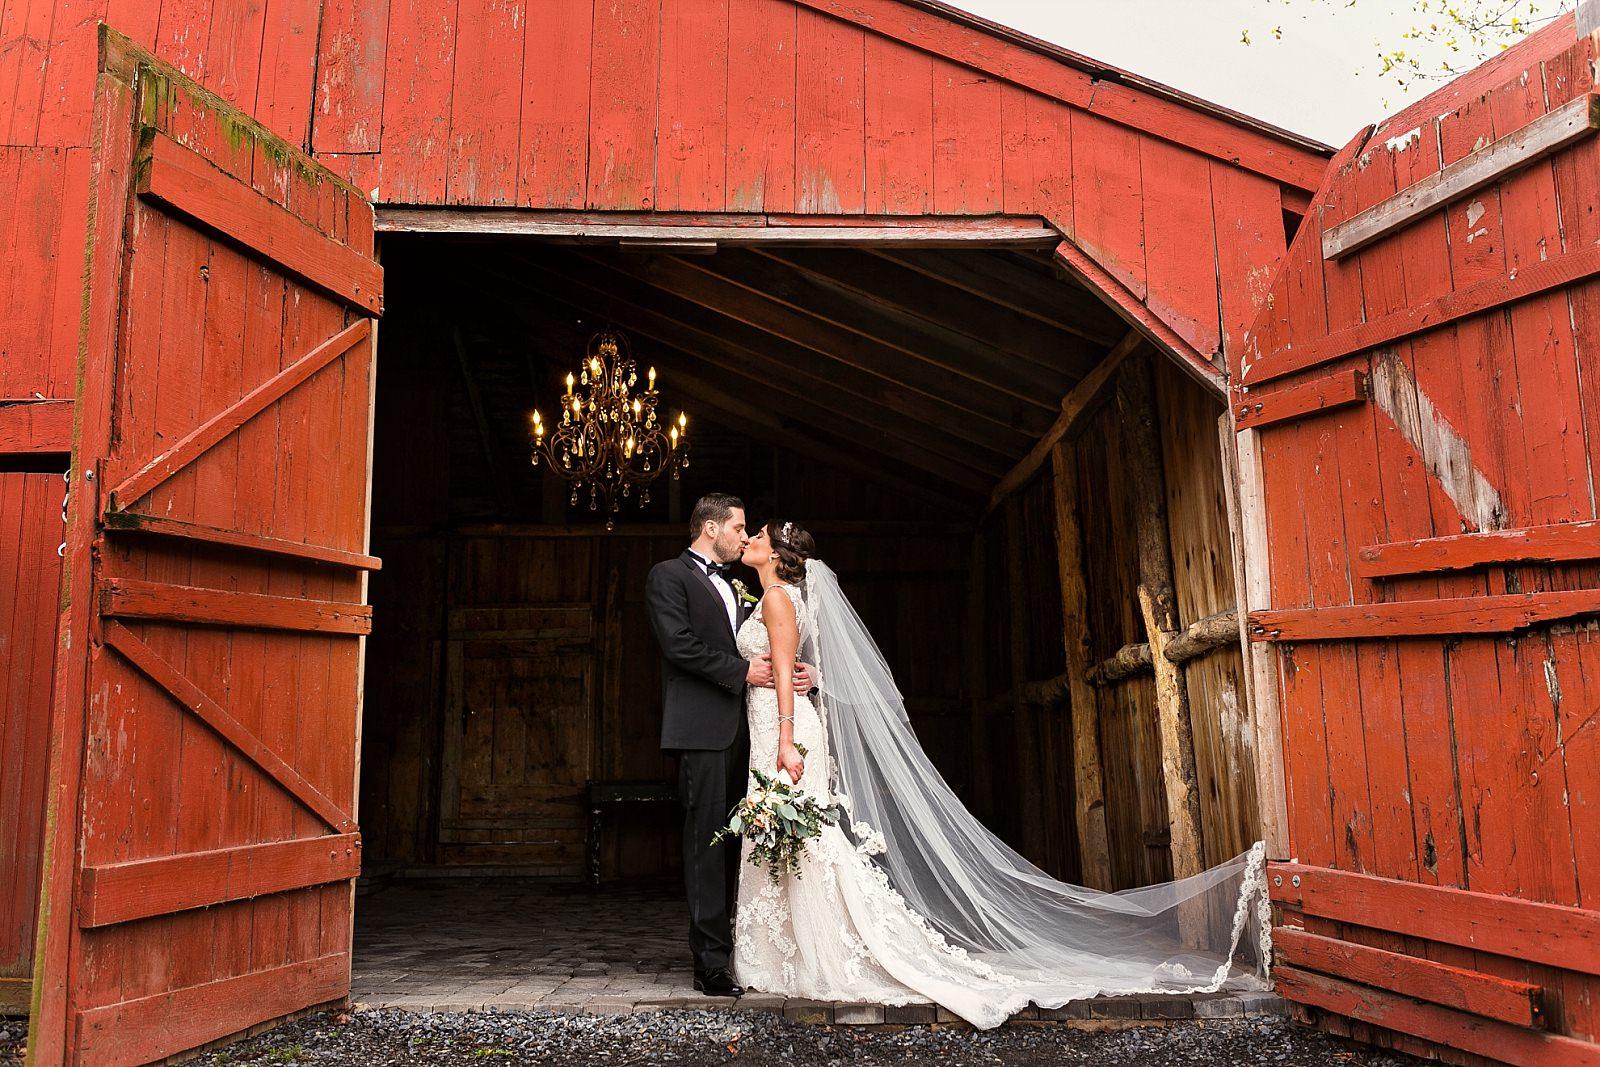 NY_Wedding_Photographer_NiPe_26.jpg